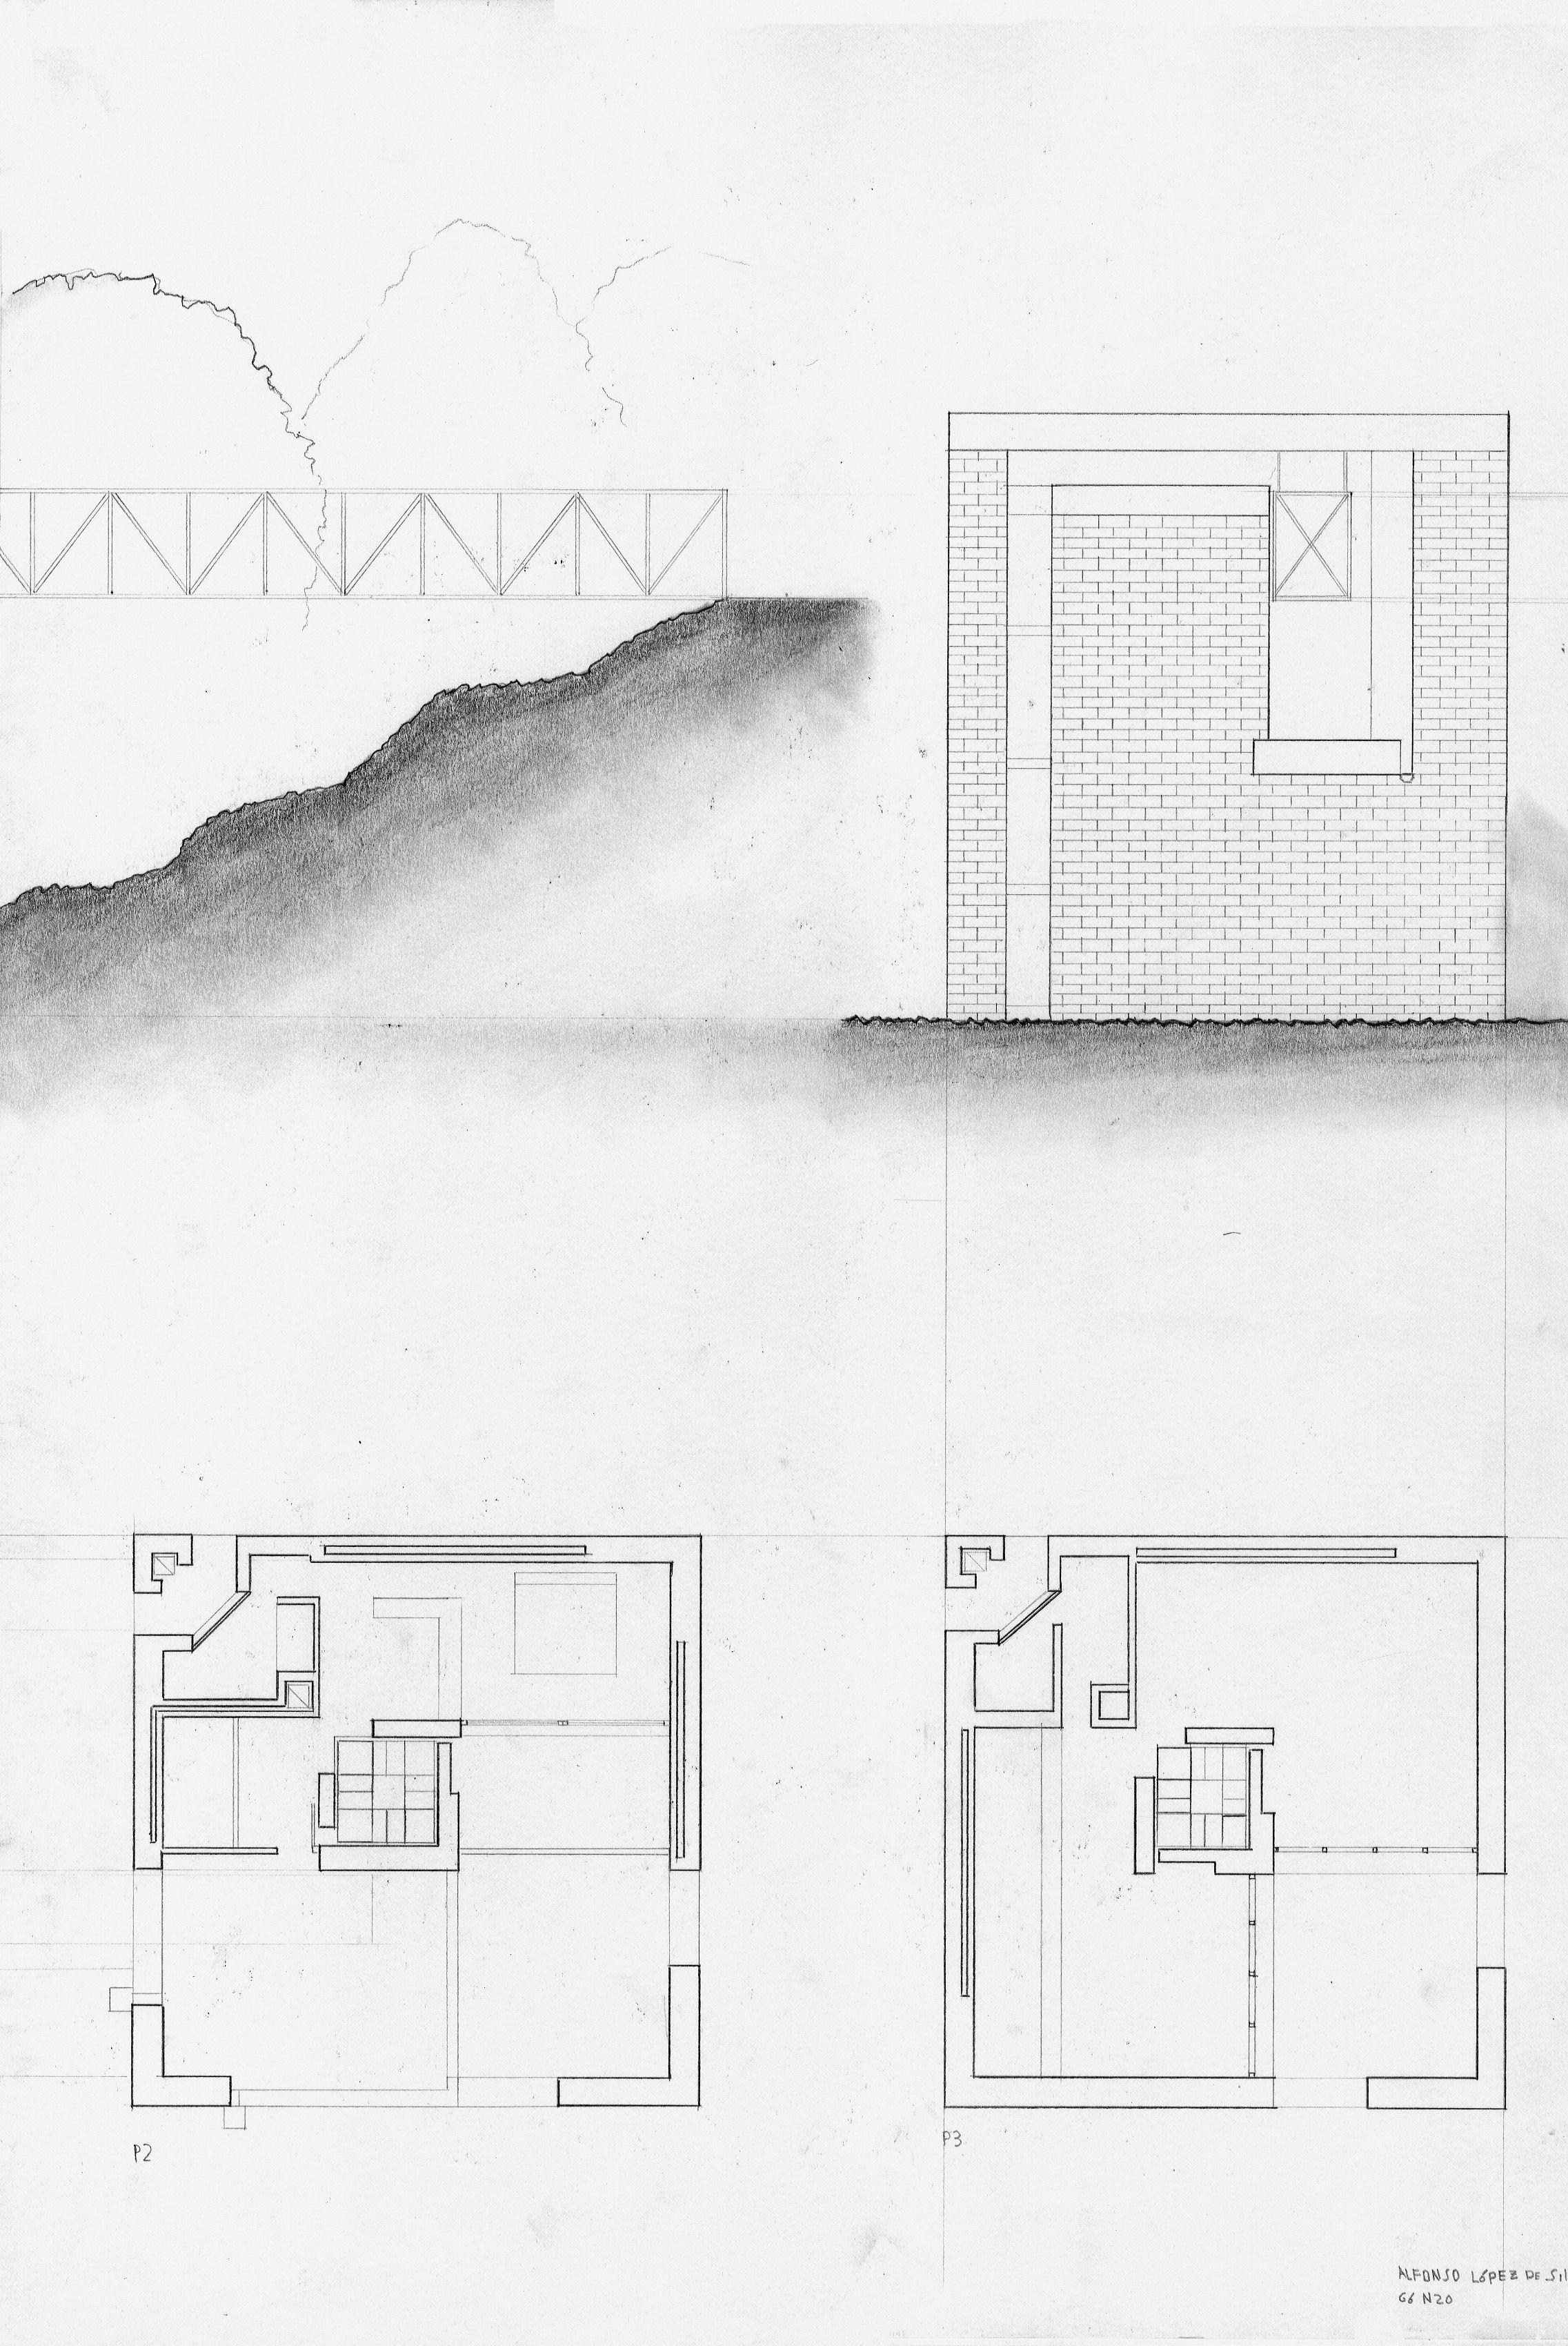 Villa Bianchi Architectural Drawing Diagram And Presentation Drawings Villas Mario Architecture Sketches